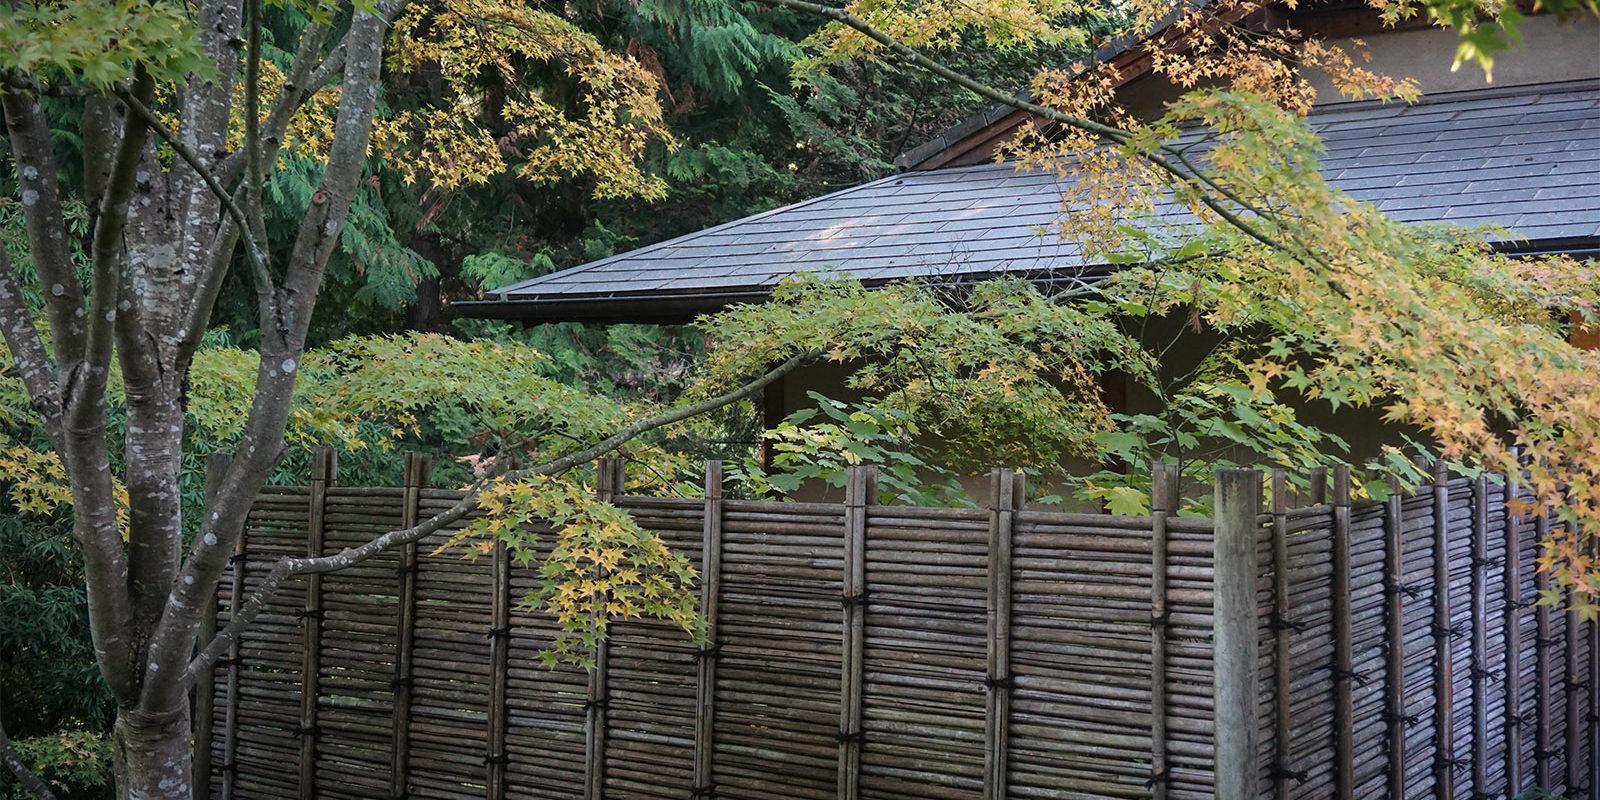 October Fall Photos of Portland Japanese Garden - 2018-10-22 - DSC01047_low